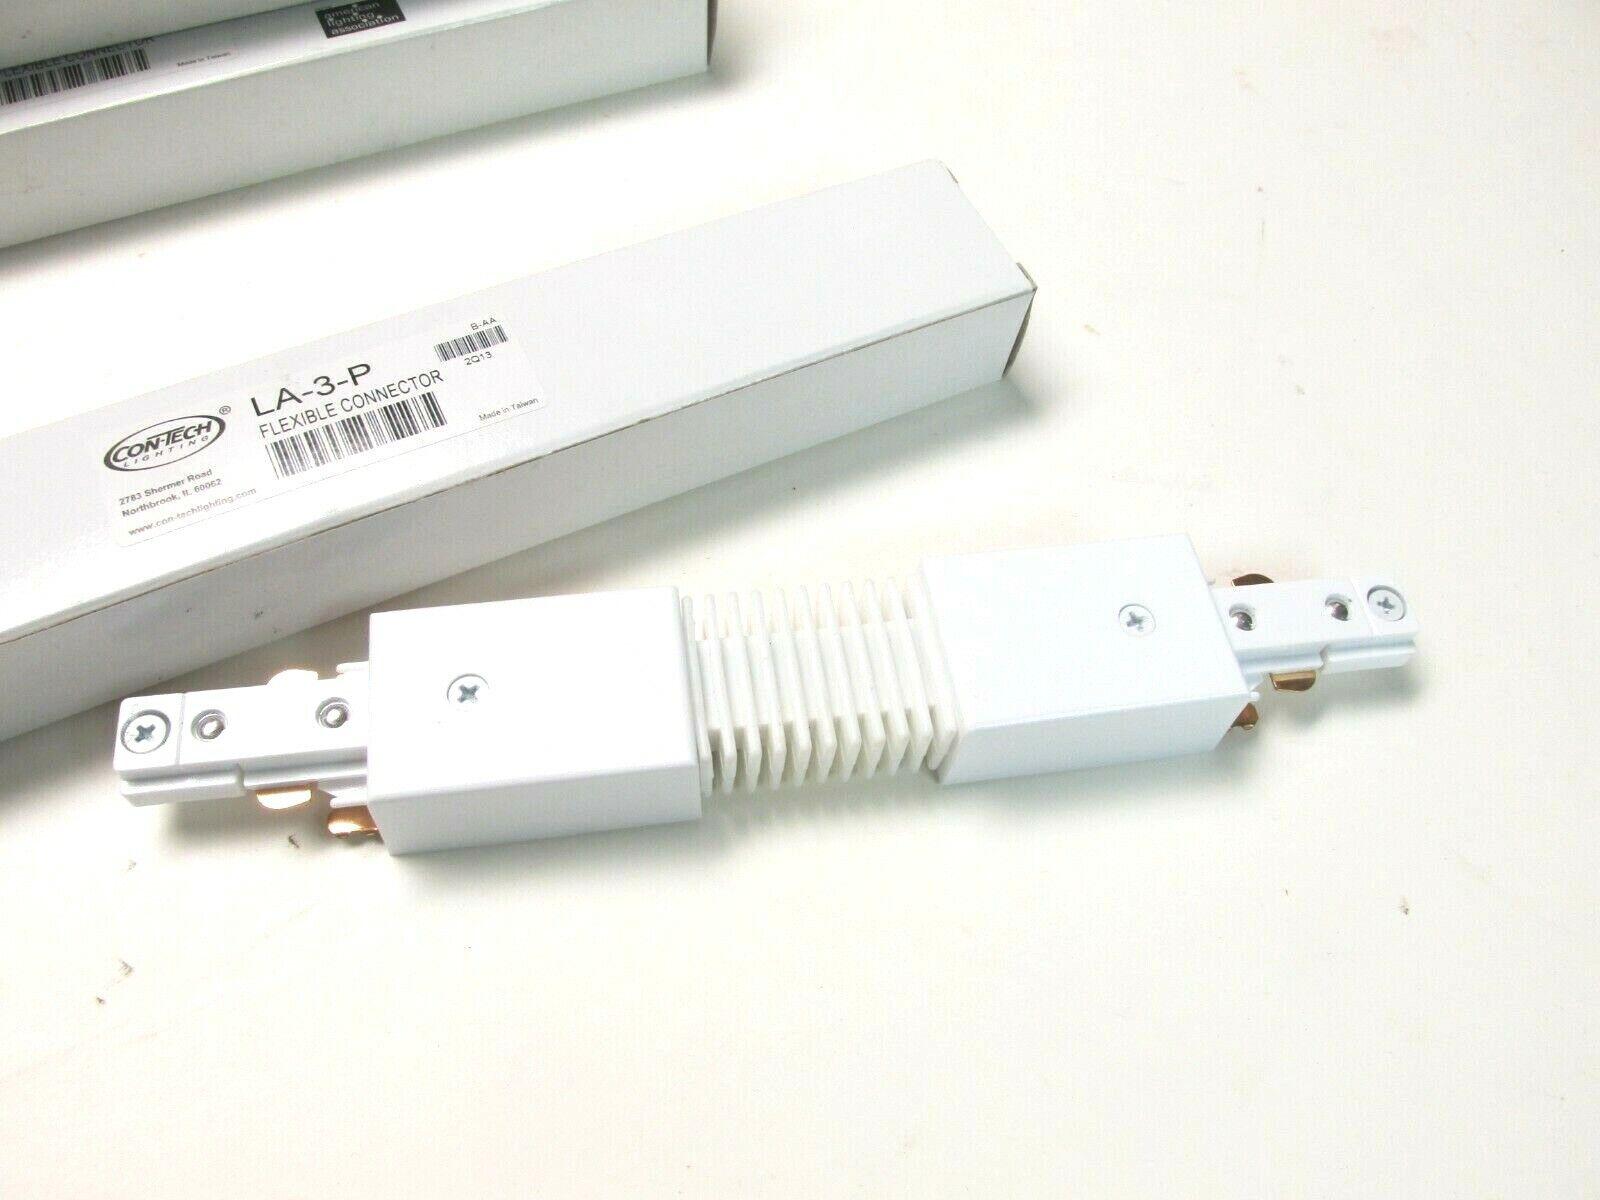 Contech la 3 p flexible connector track lighting coupling white finish la3p